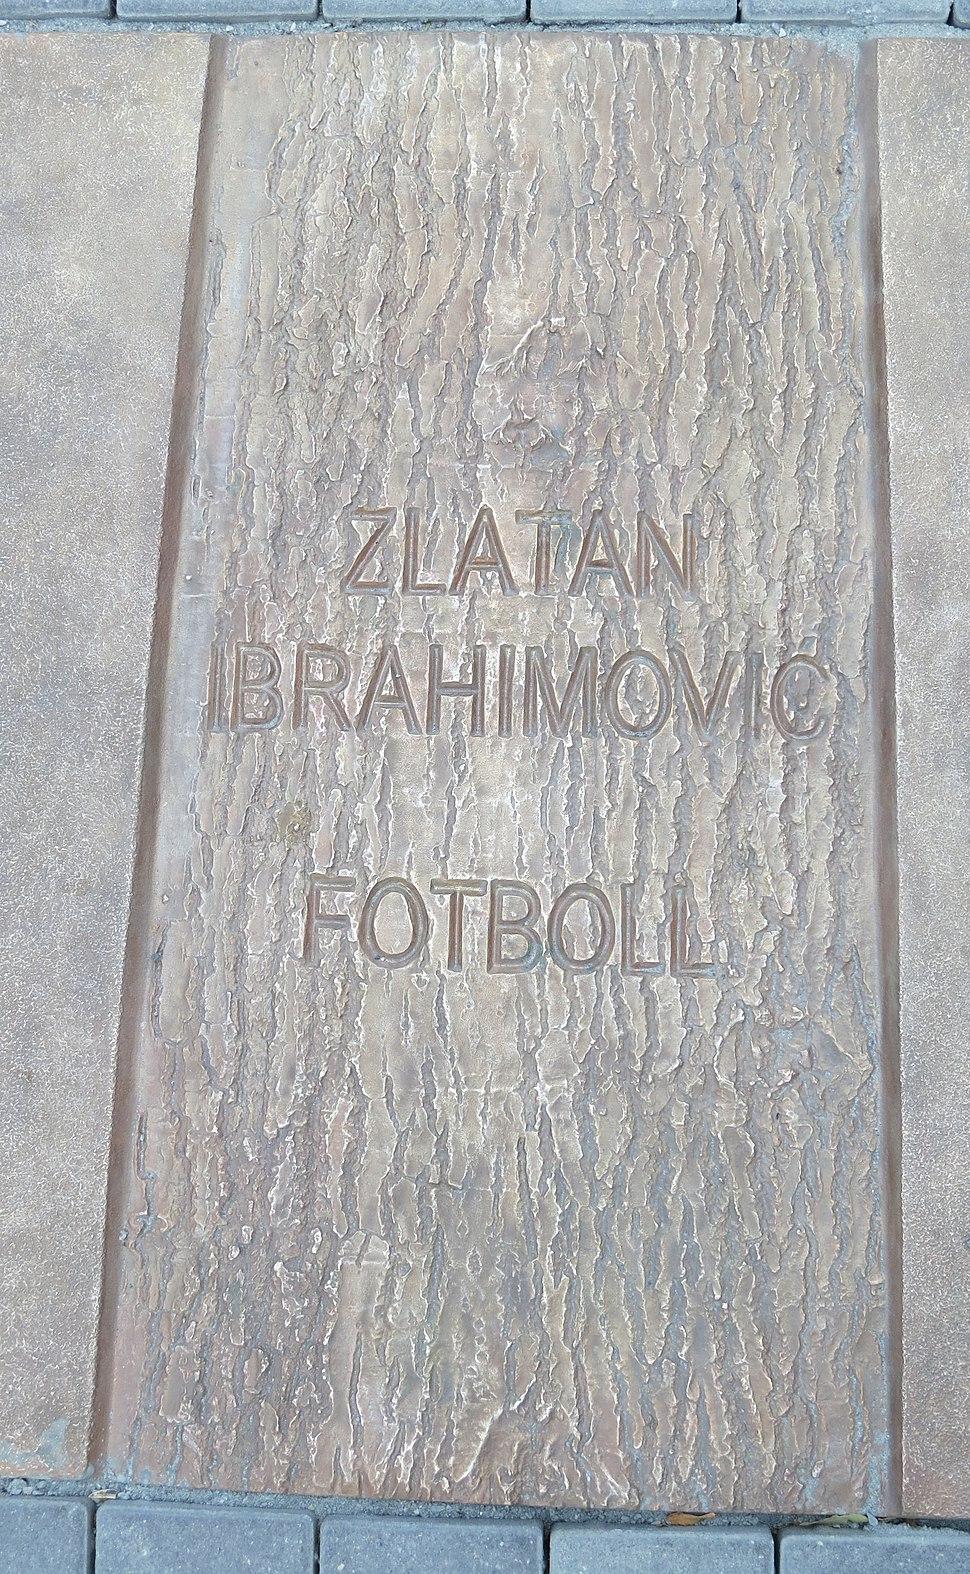 Malm%C3%B6 Idrottens walk of fame, Zlatan